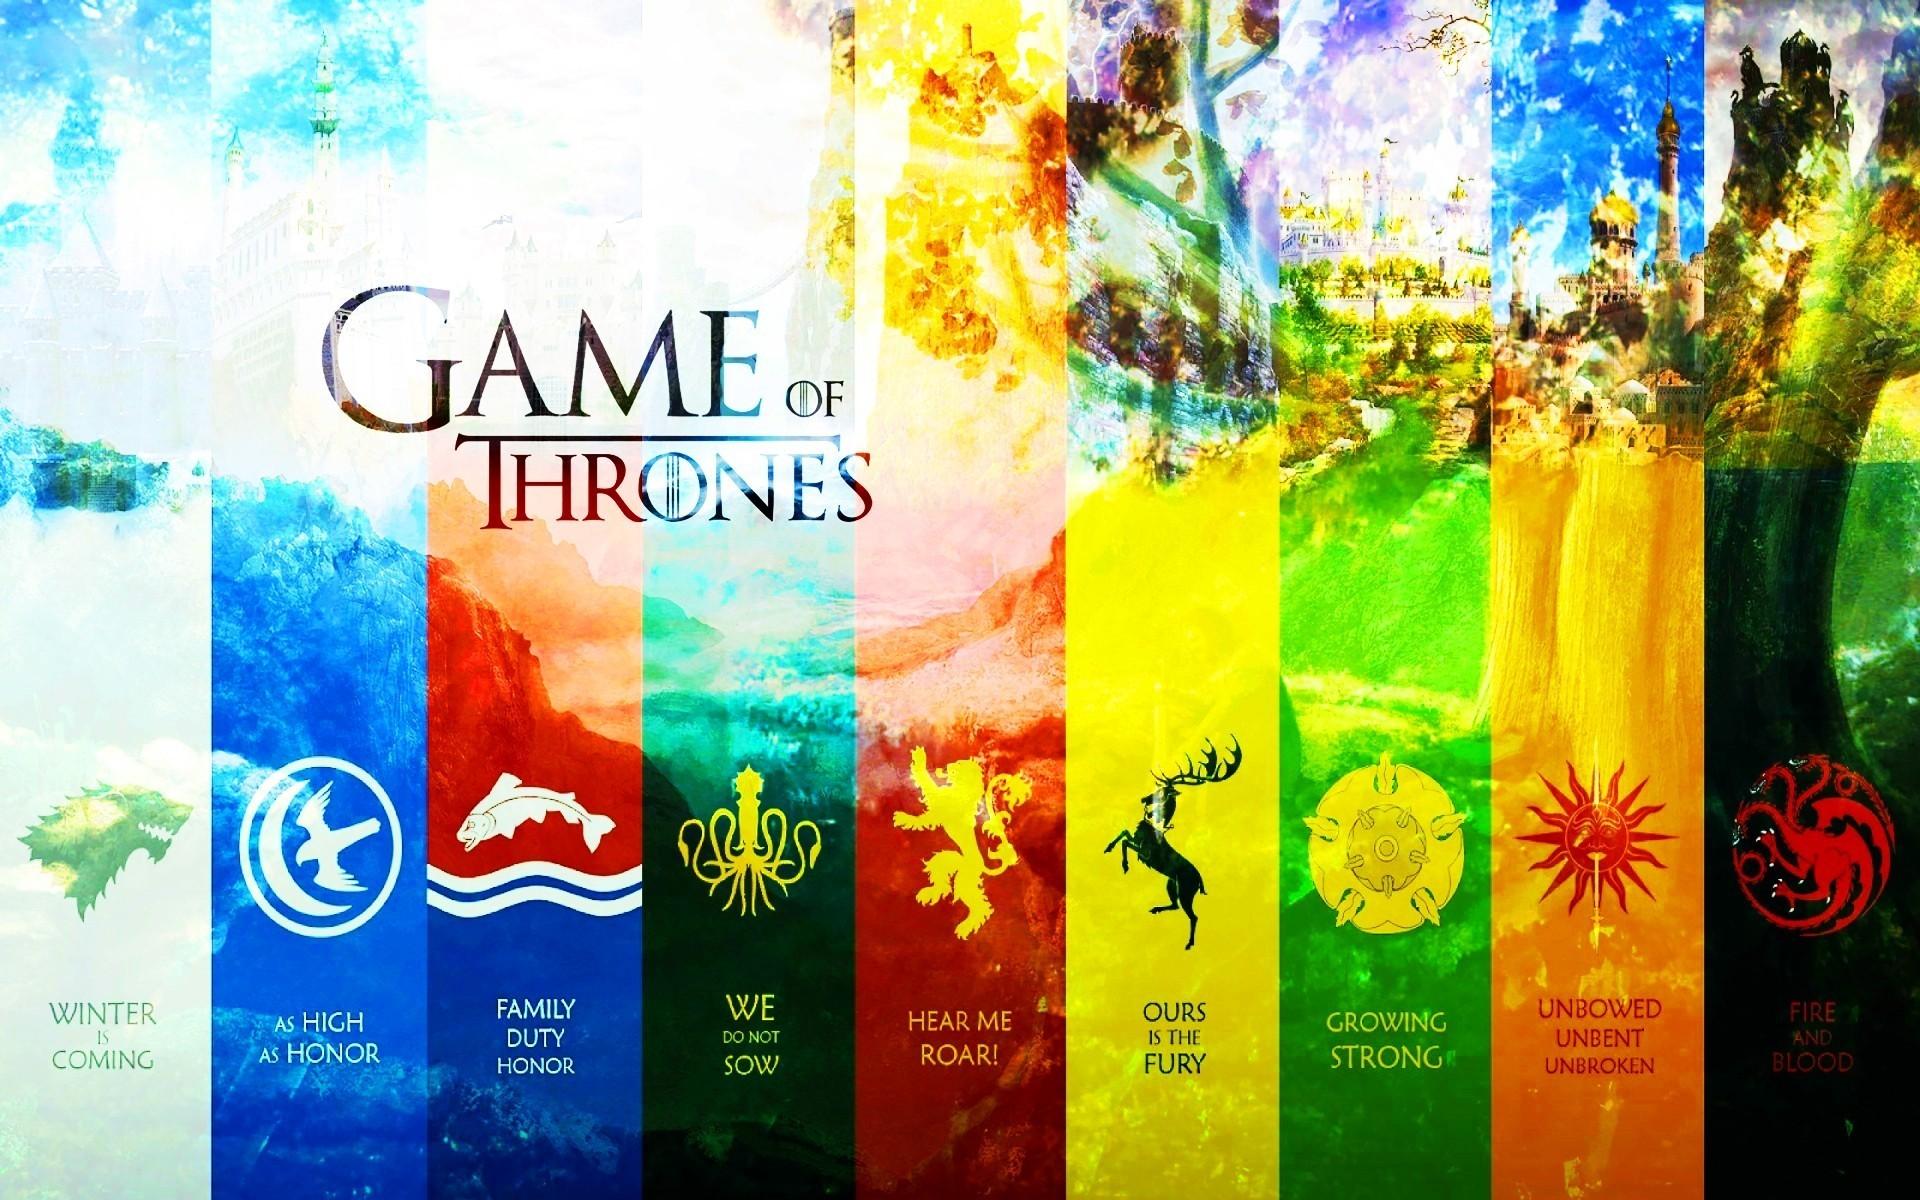 Game of thrones house arryn baratheon greyjoy lannister wallpaper 1920x1200